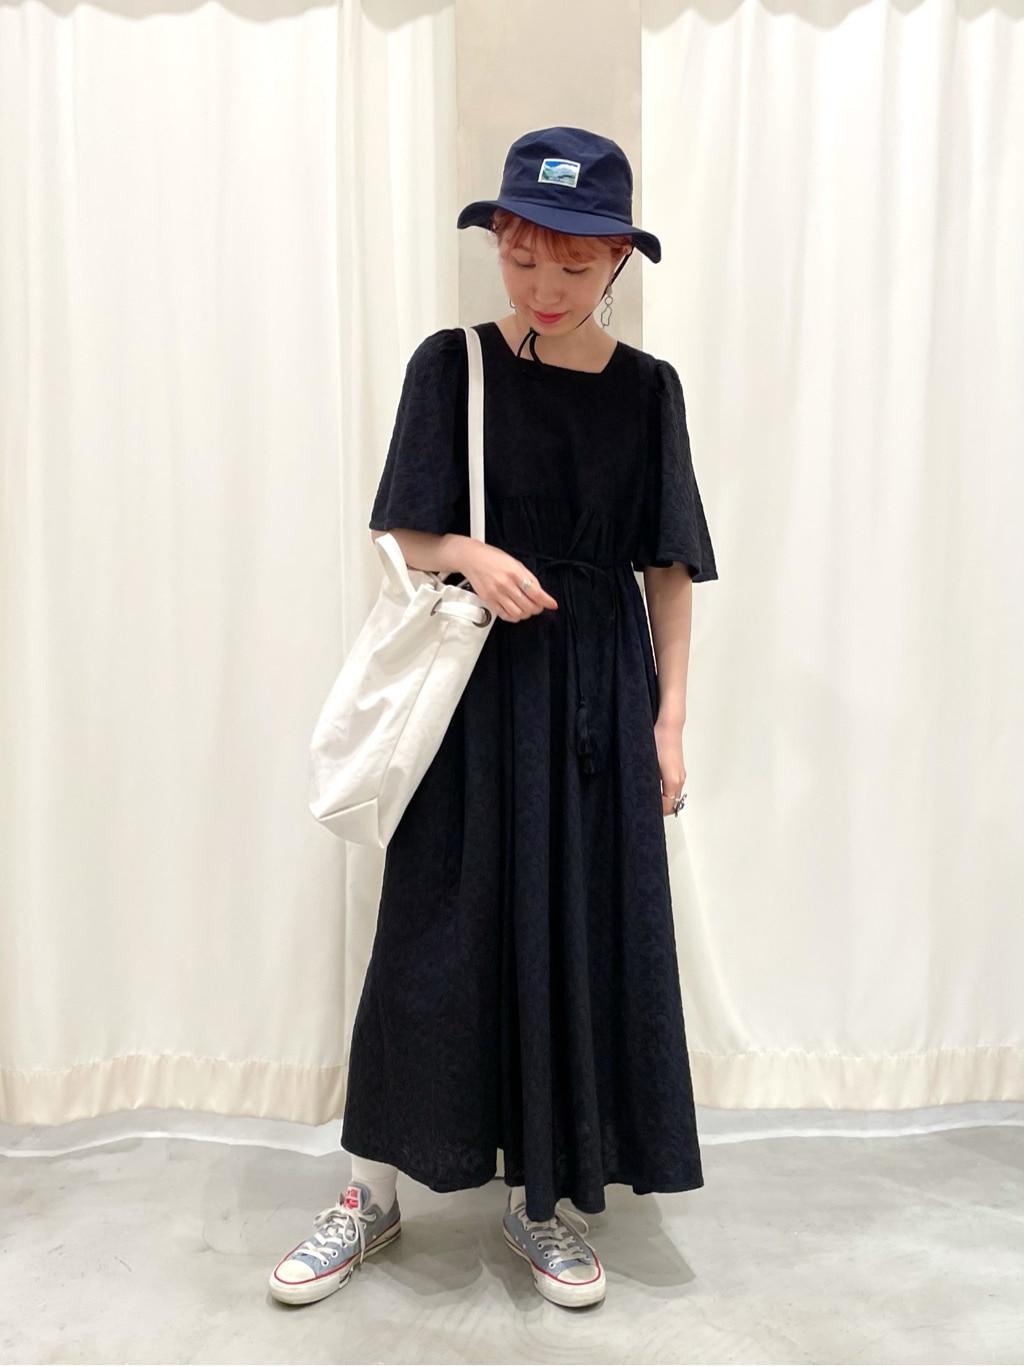 CHILD WOMAN , PAR ICI 東京スカイツリータウン・ソラマチ 2021.06.10